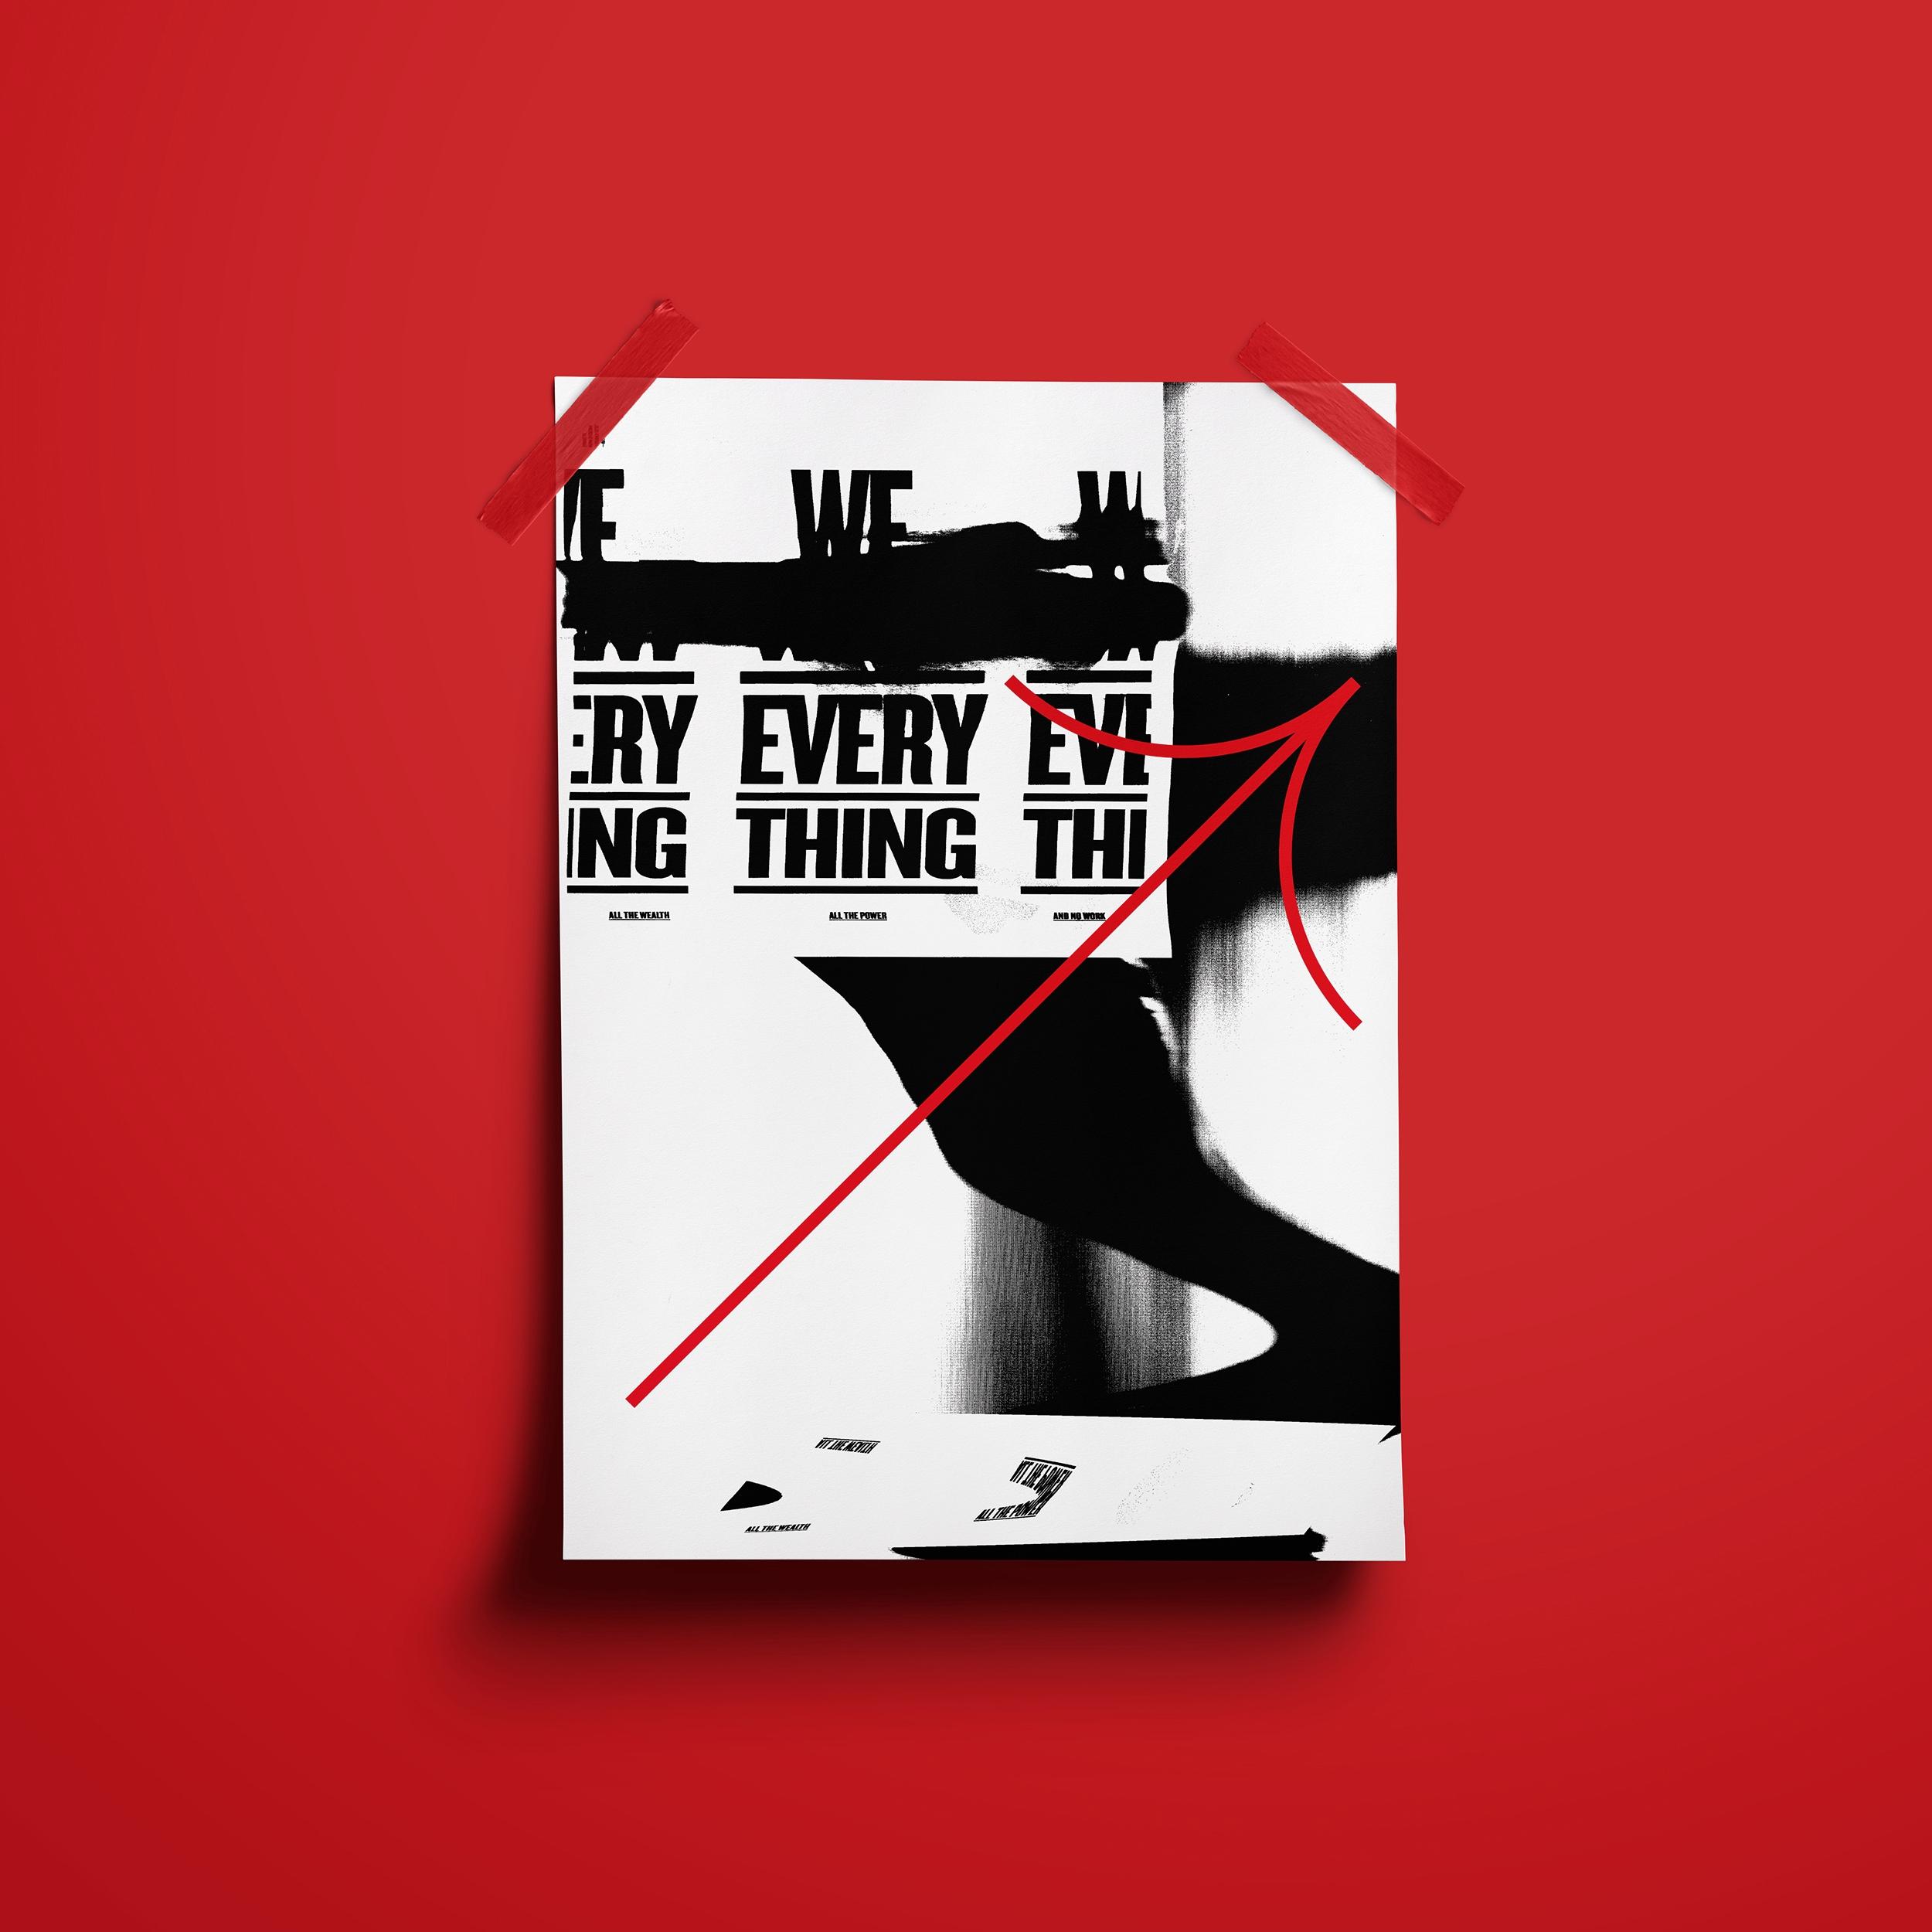 We Want Everything 4. A series  - canefantasma | ello